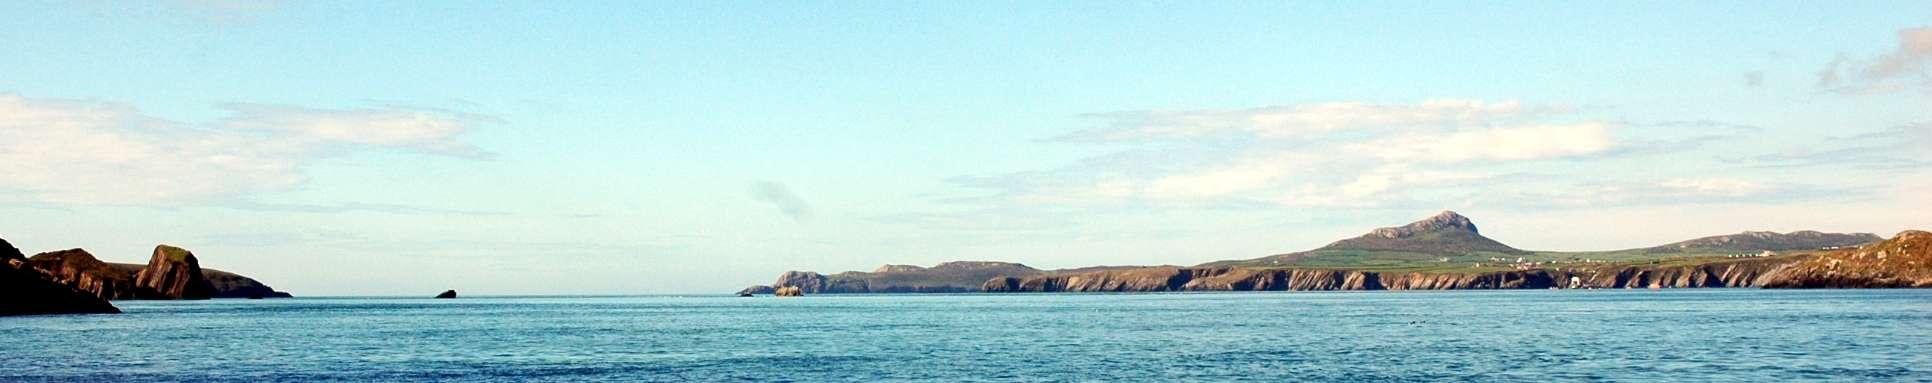 Ramsey island and St Davids Head